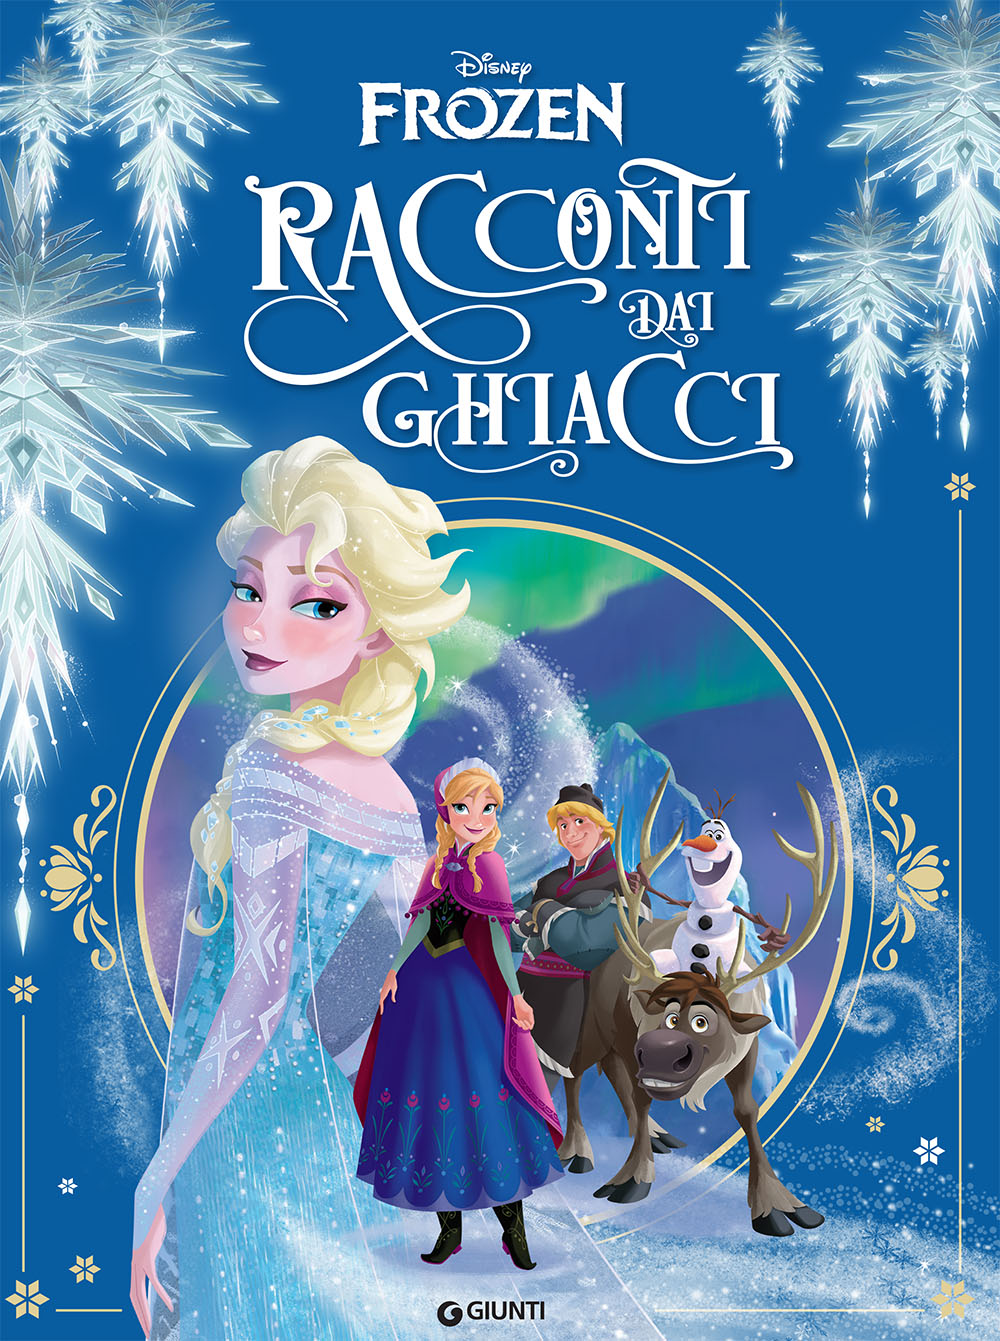 Disney Frozen Racconti dai ghiacci